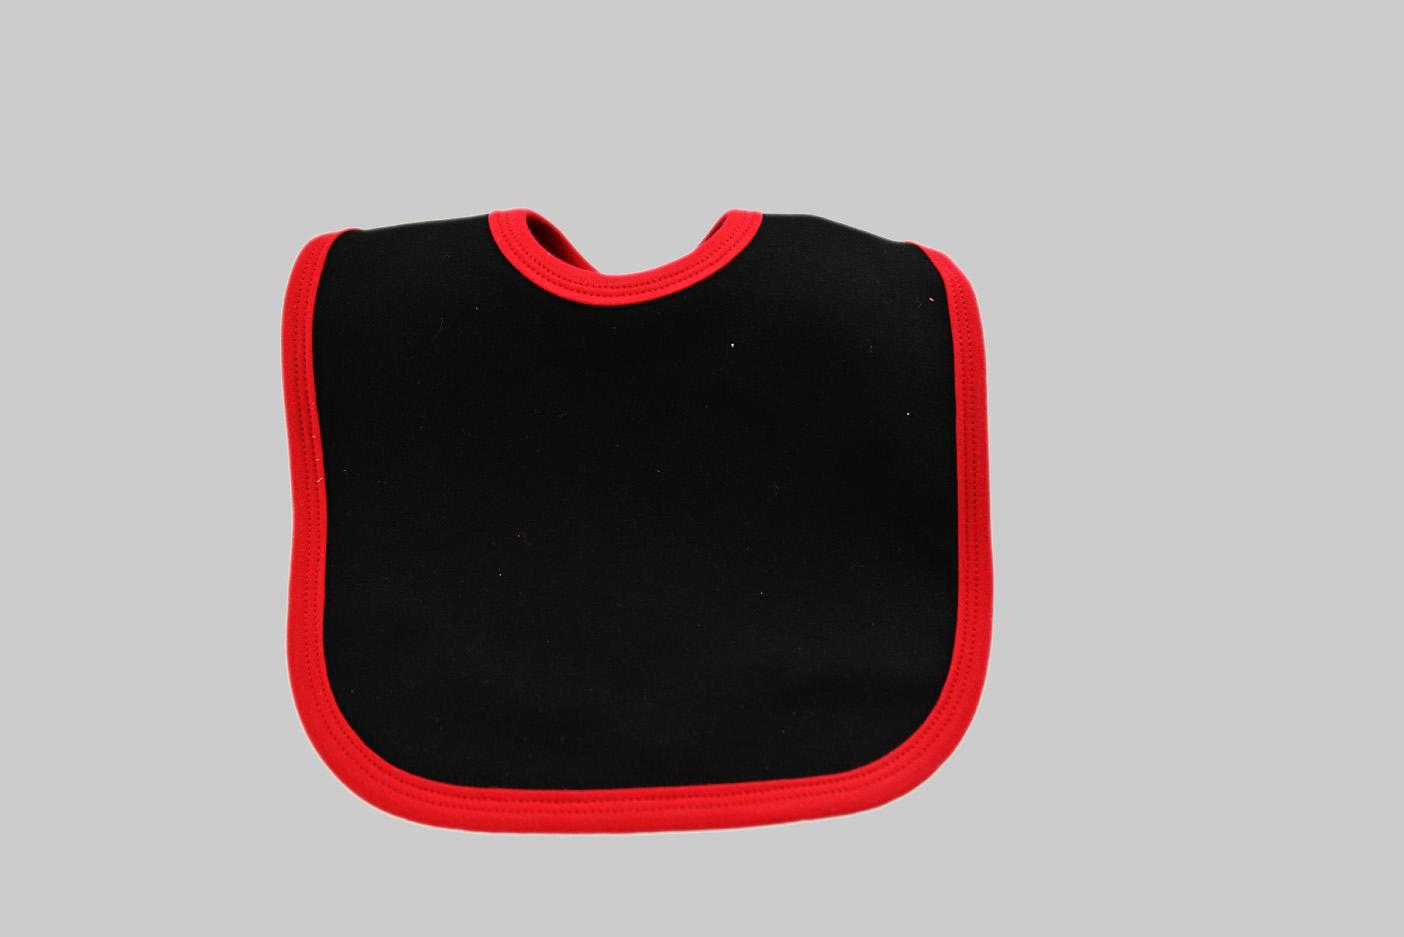 Red & Black Color Baby Bibs